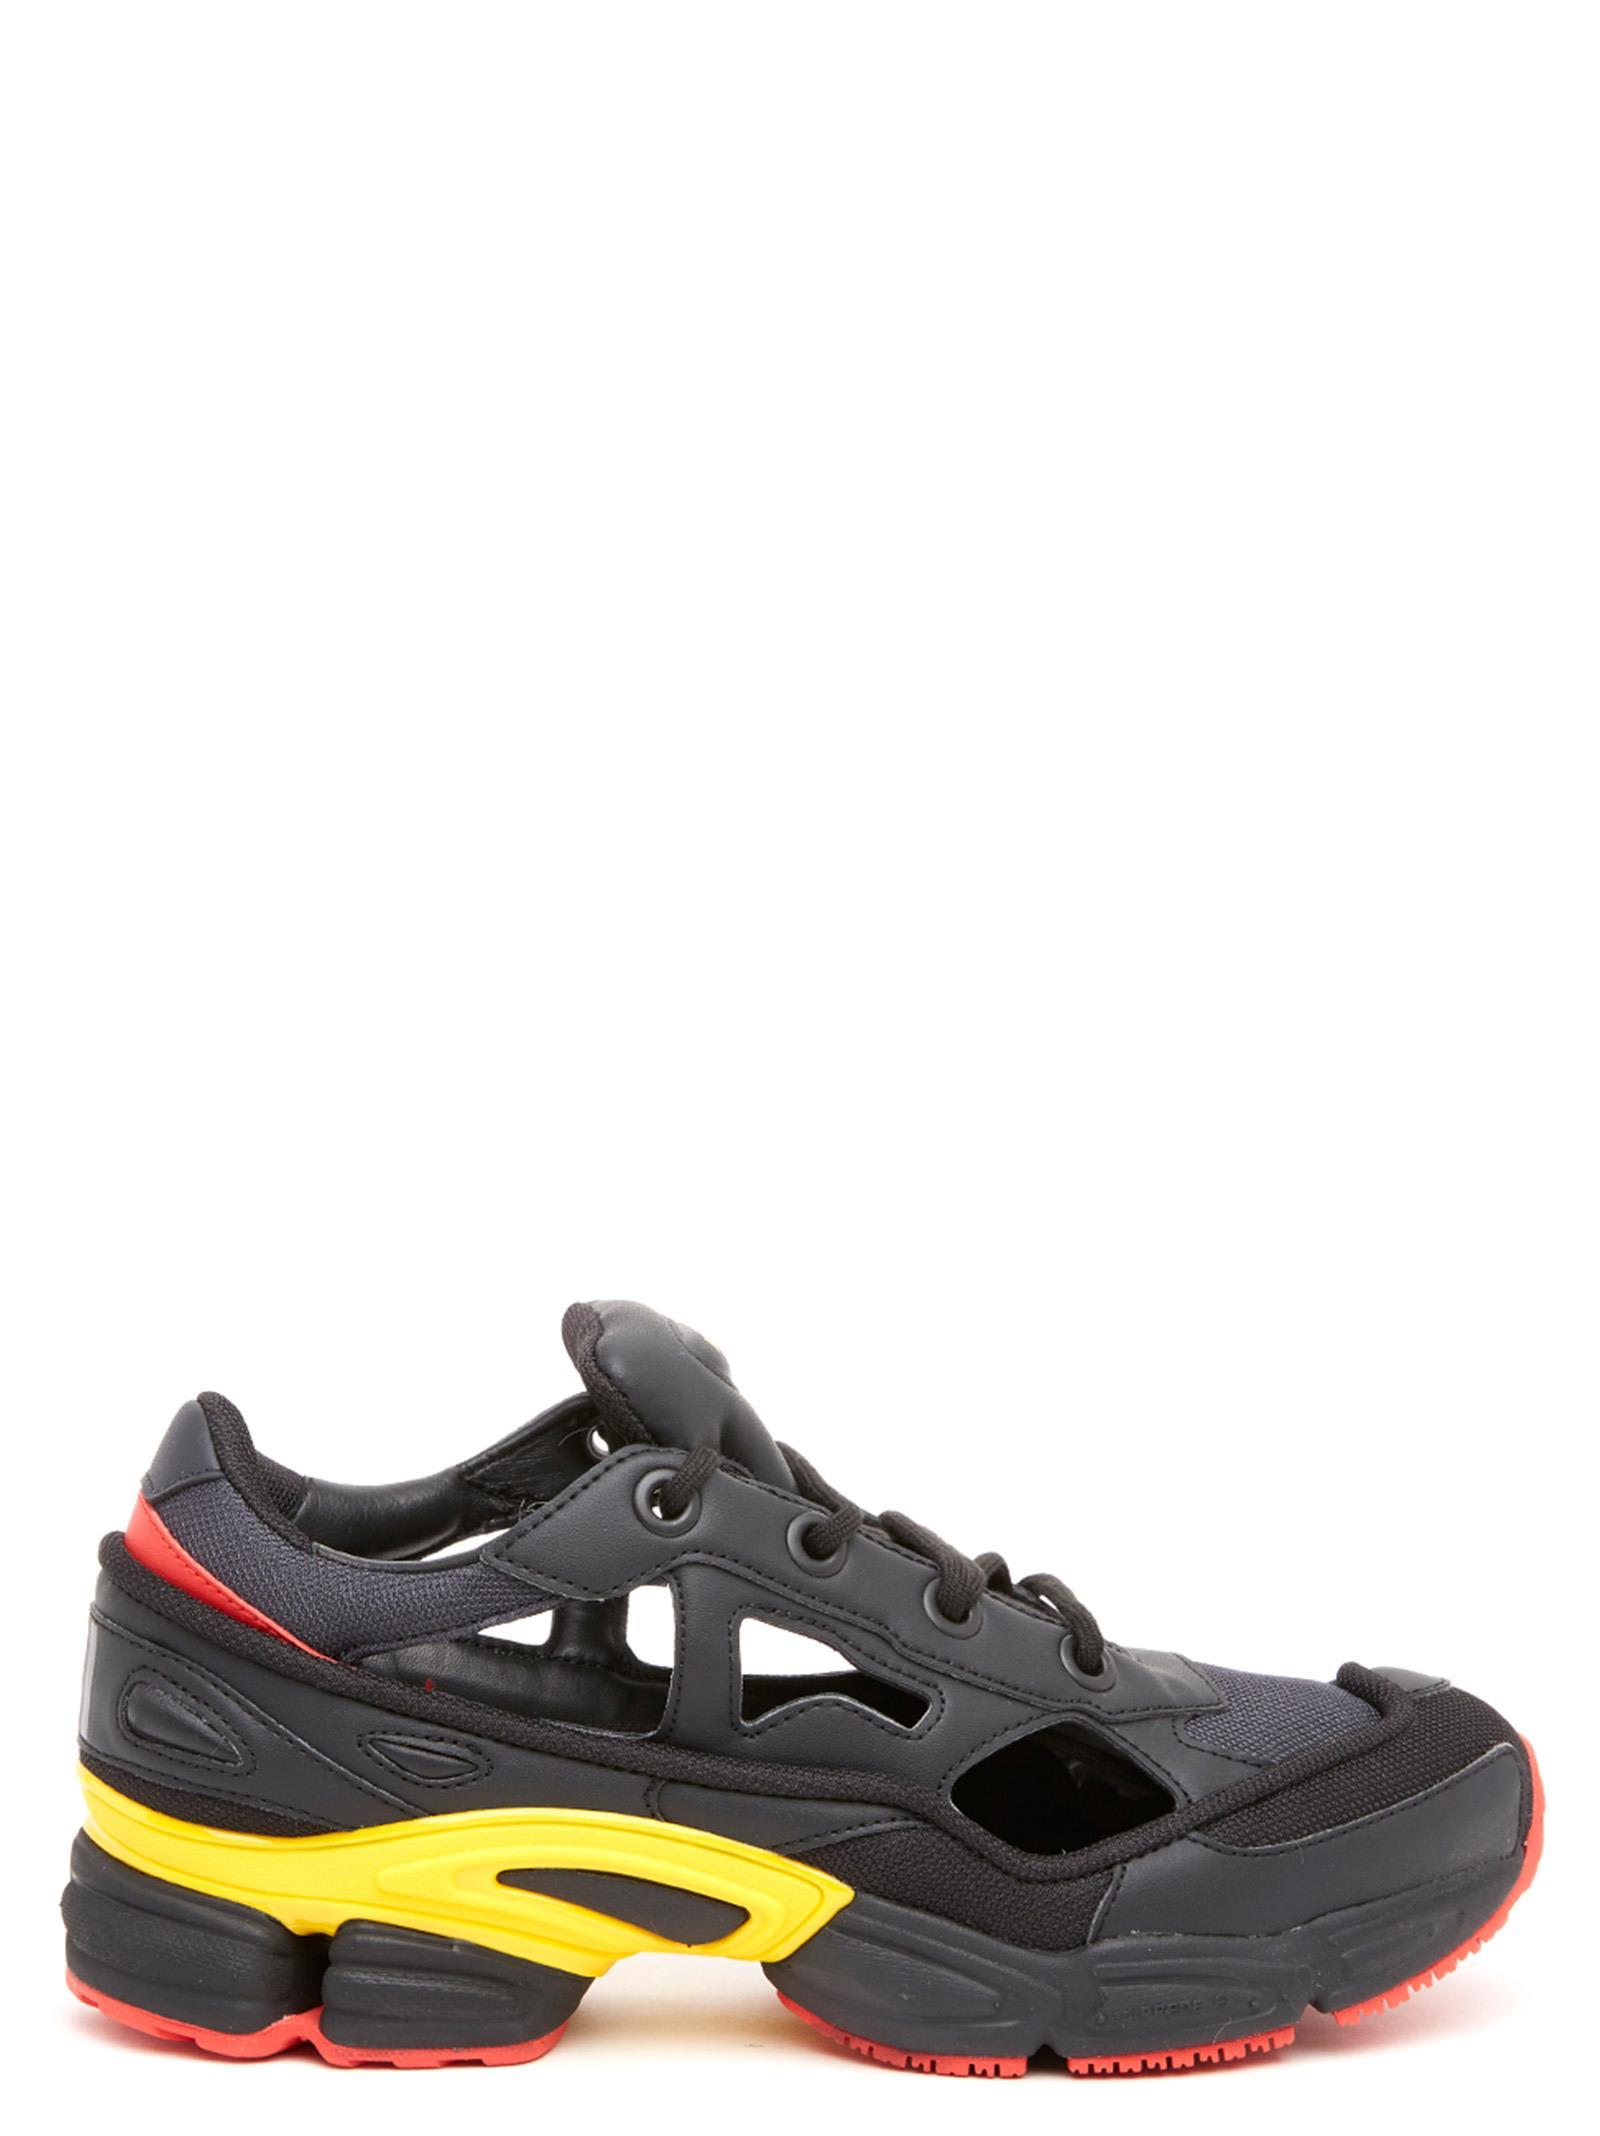 promo code 13b37 616db Adidas By Raf Simons 'ozweego Replicant' Shoes